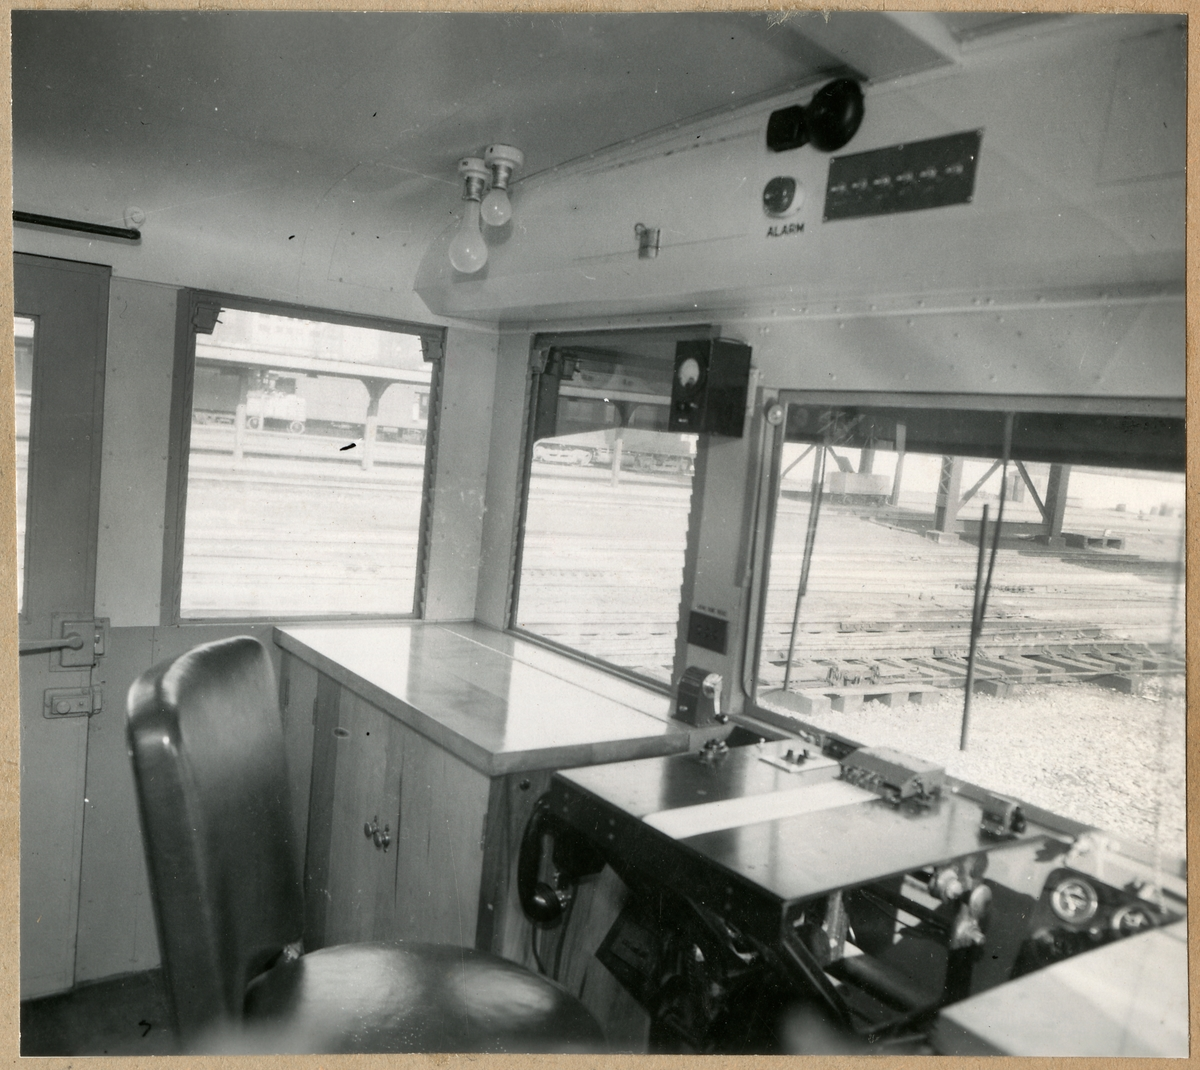 Sperry-mätvagn littera DC2 från Illinois Central Railroad, USA. 1 maj 1945.